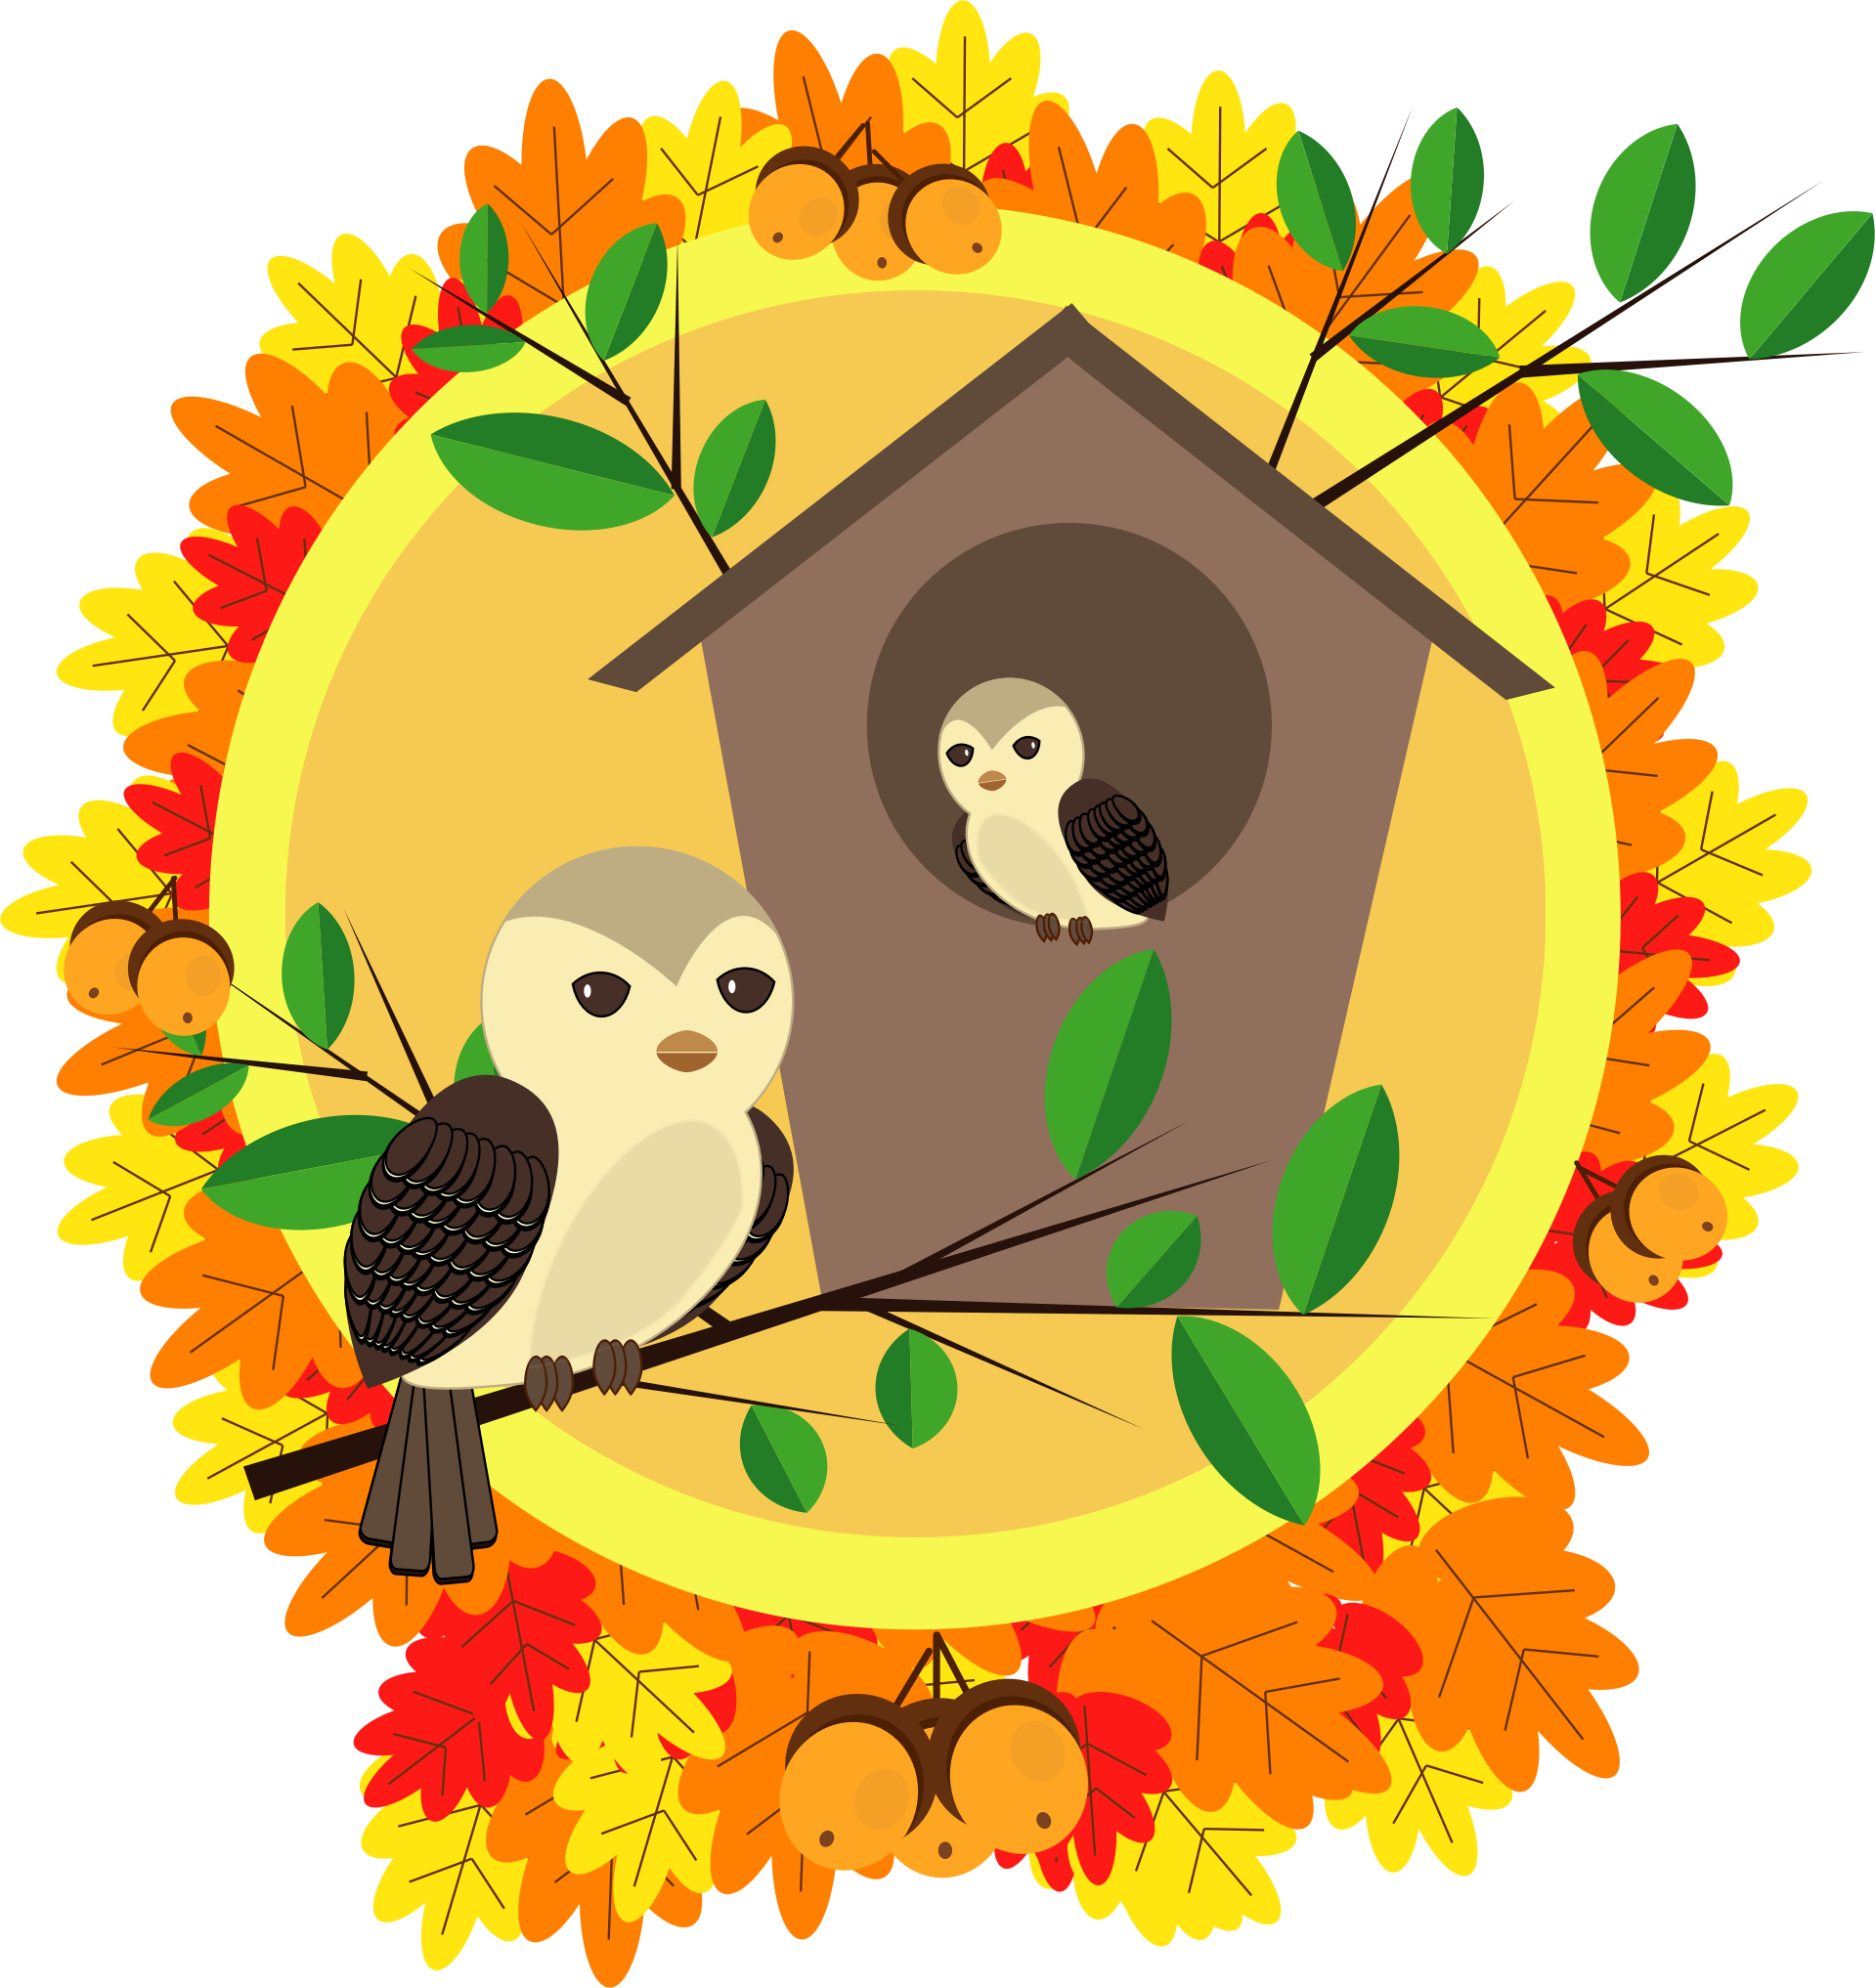 Clipart happy autumn. Big image png